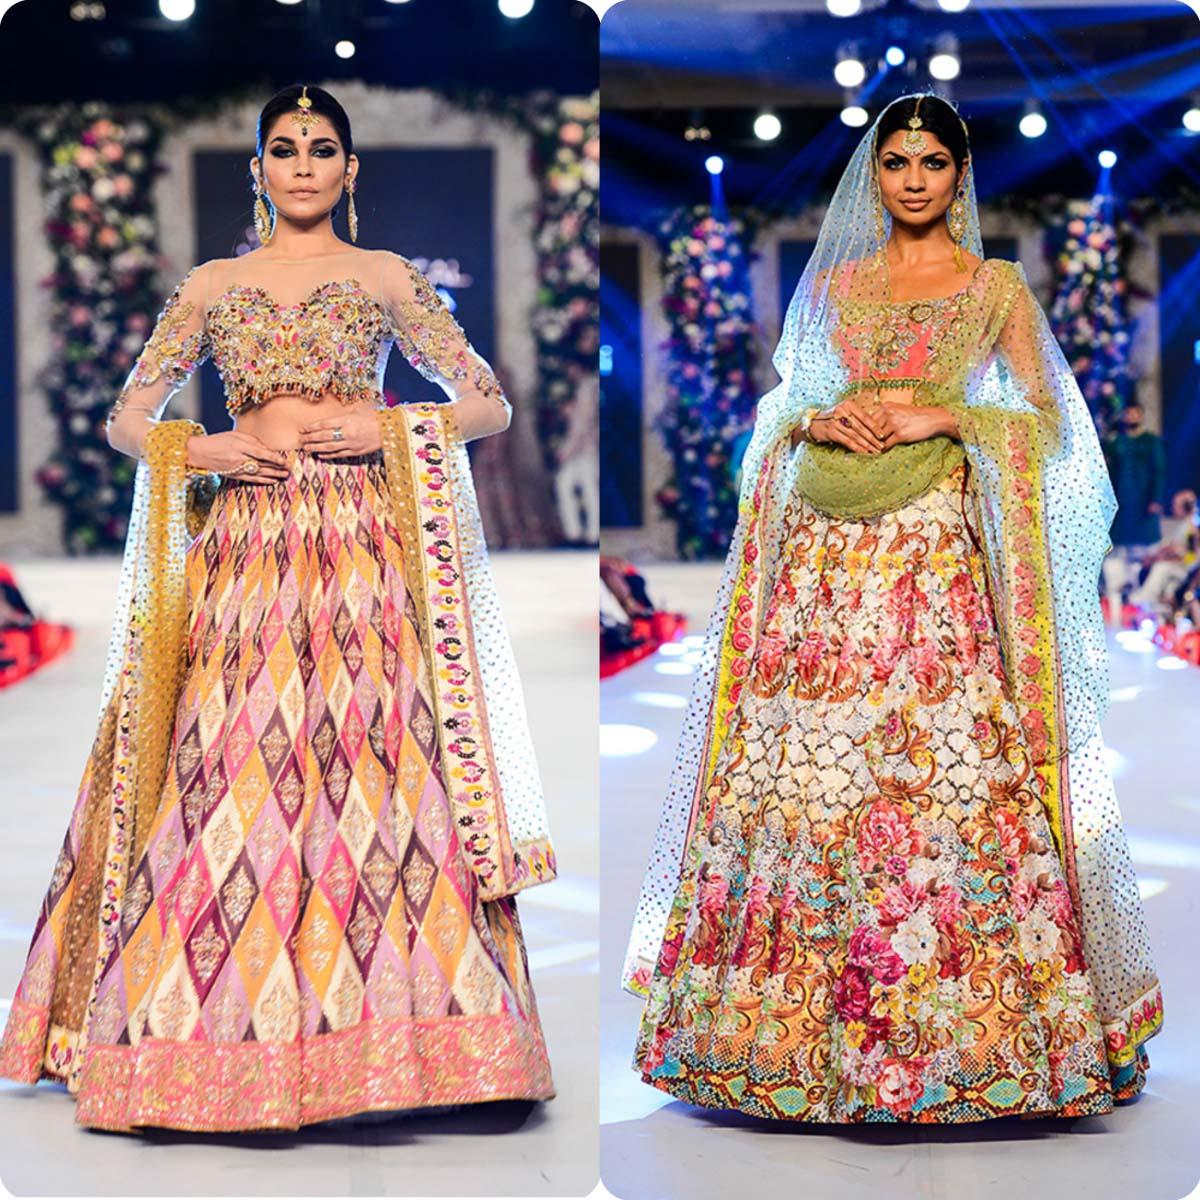 Nomi Ansari Bridal Wear Collection Ft-Junaid Khan & Maya Ali 2016-17 (6)